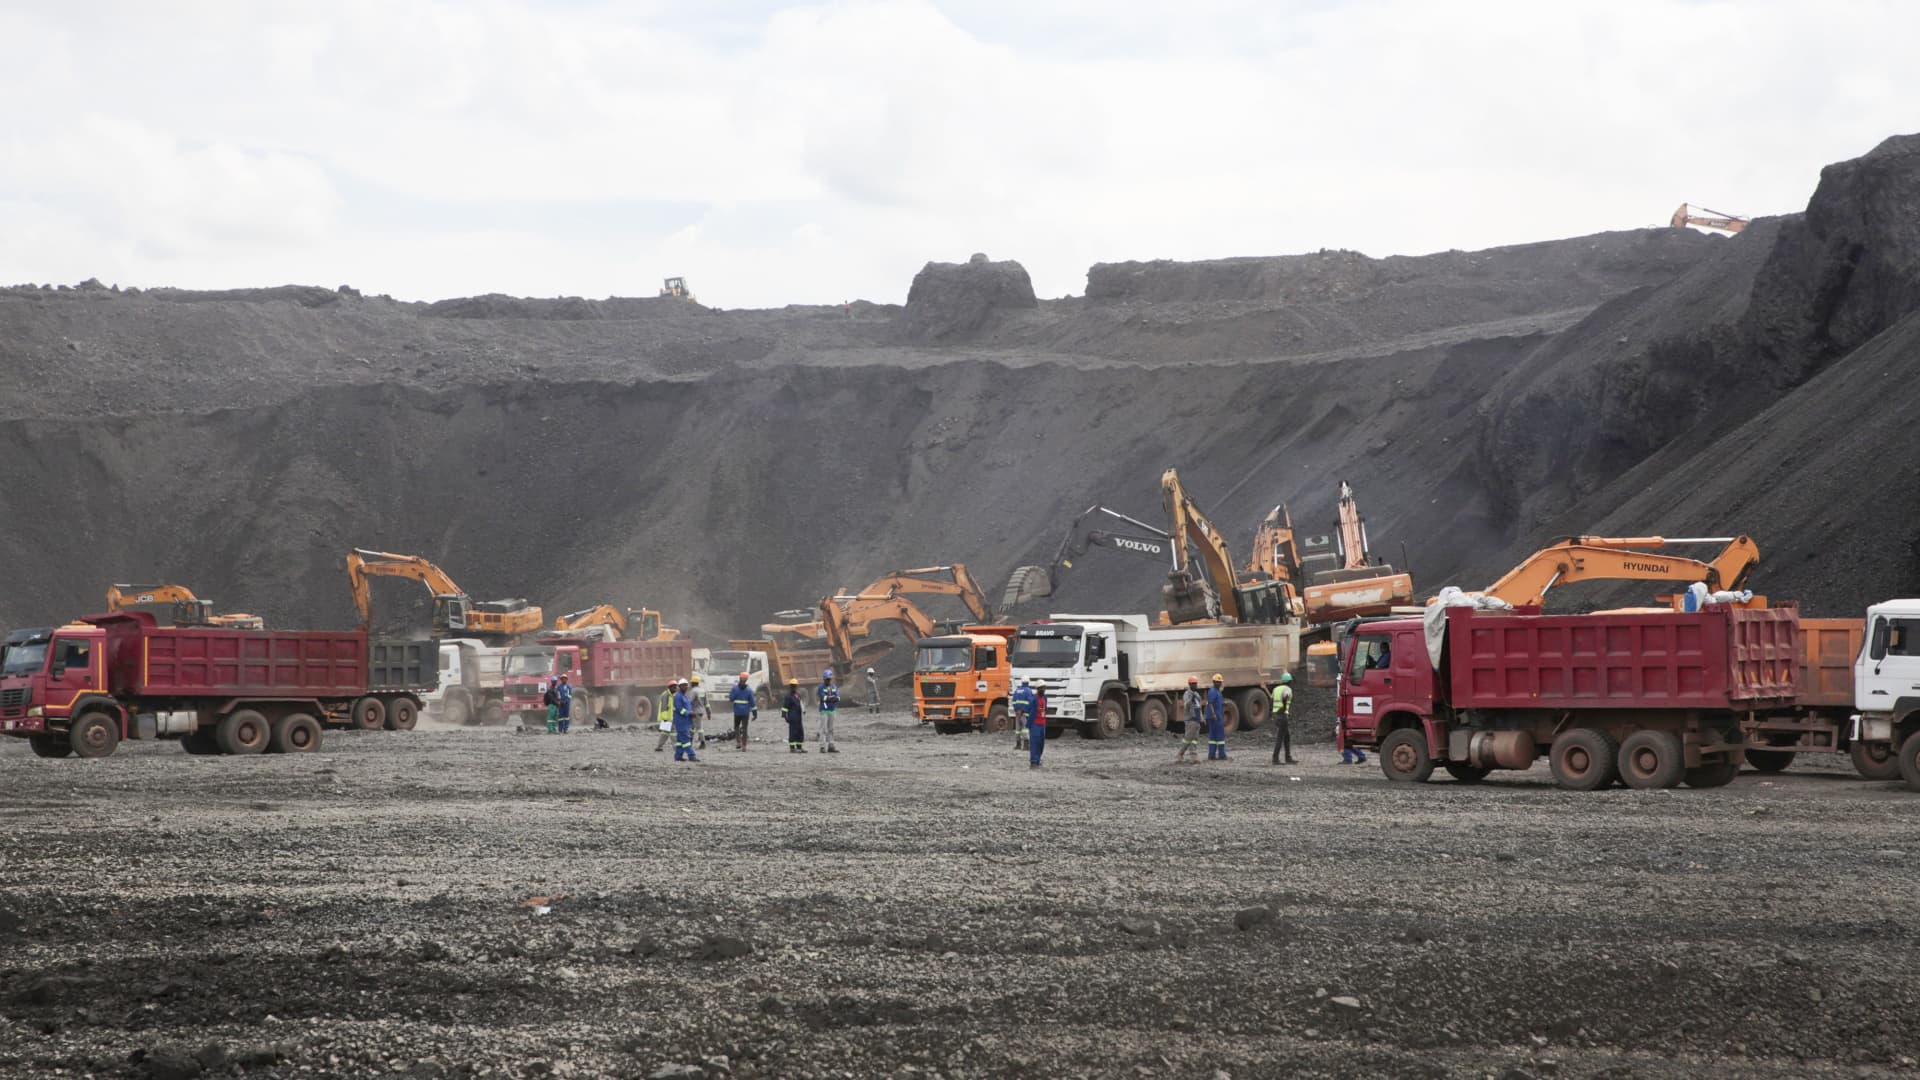 Kitwe, ZAMBIA - Copper is mined at the Mopani Glencore copper mine on January 09, 2019 in Kitwe, Zambia.